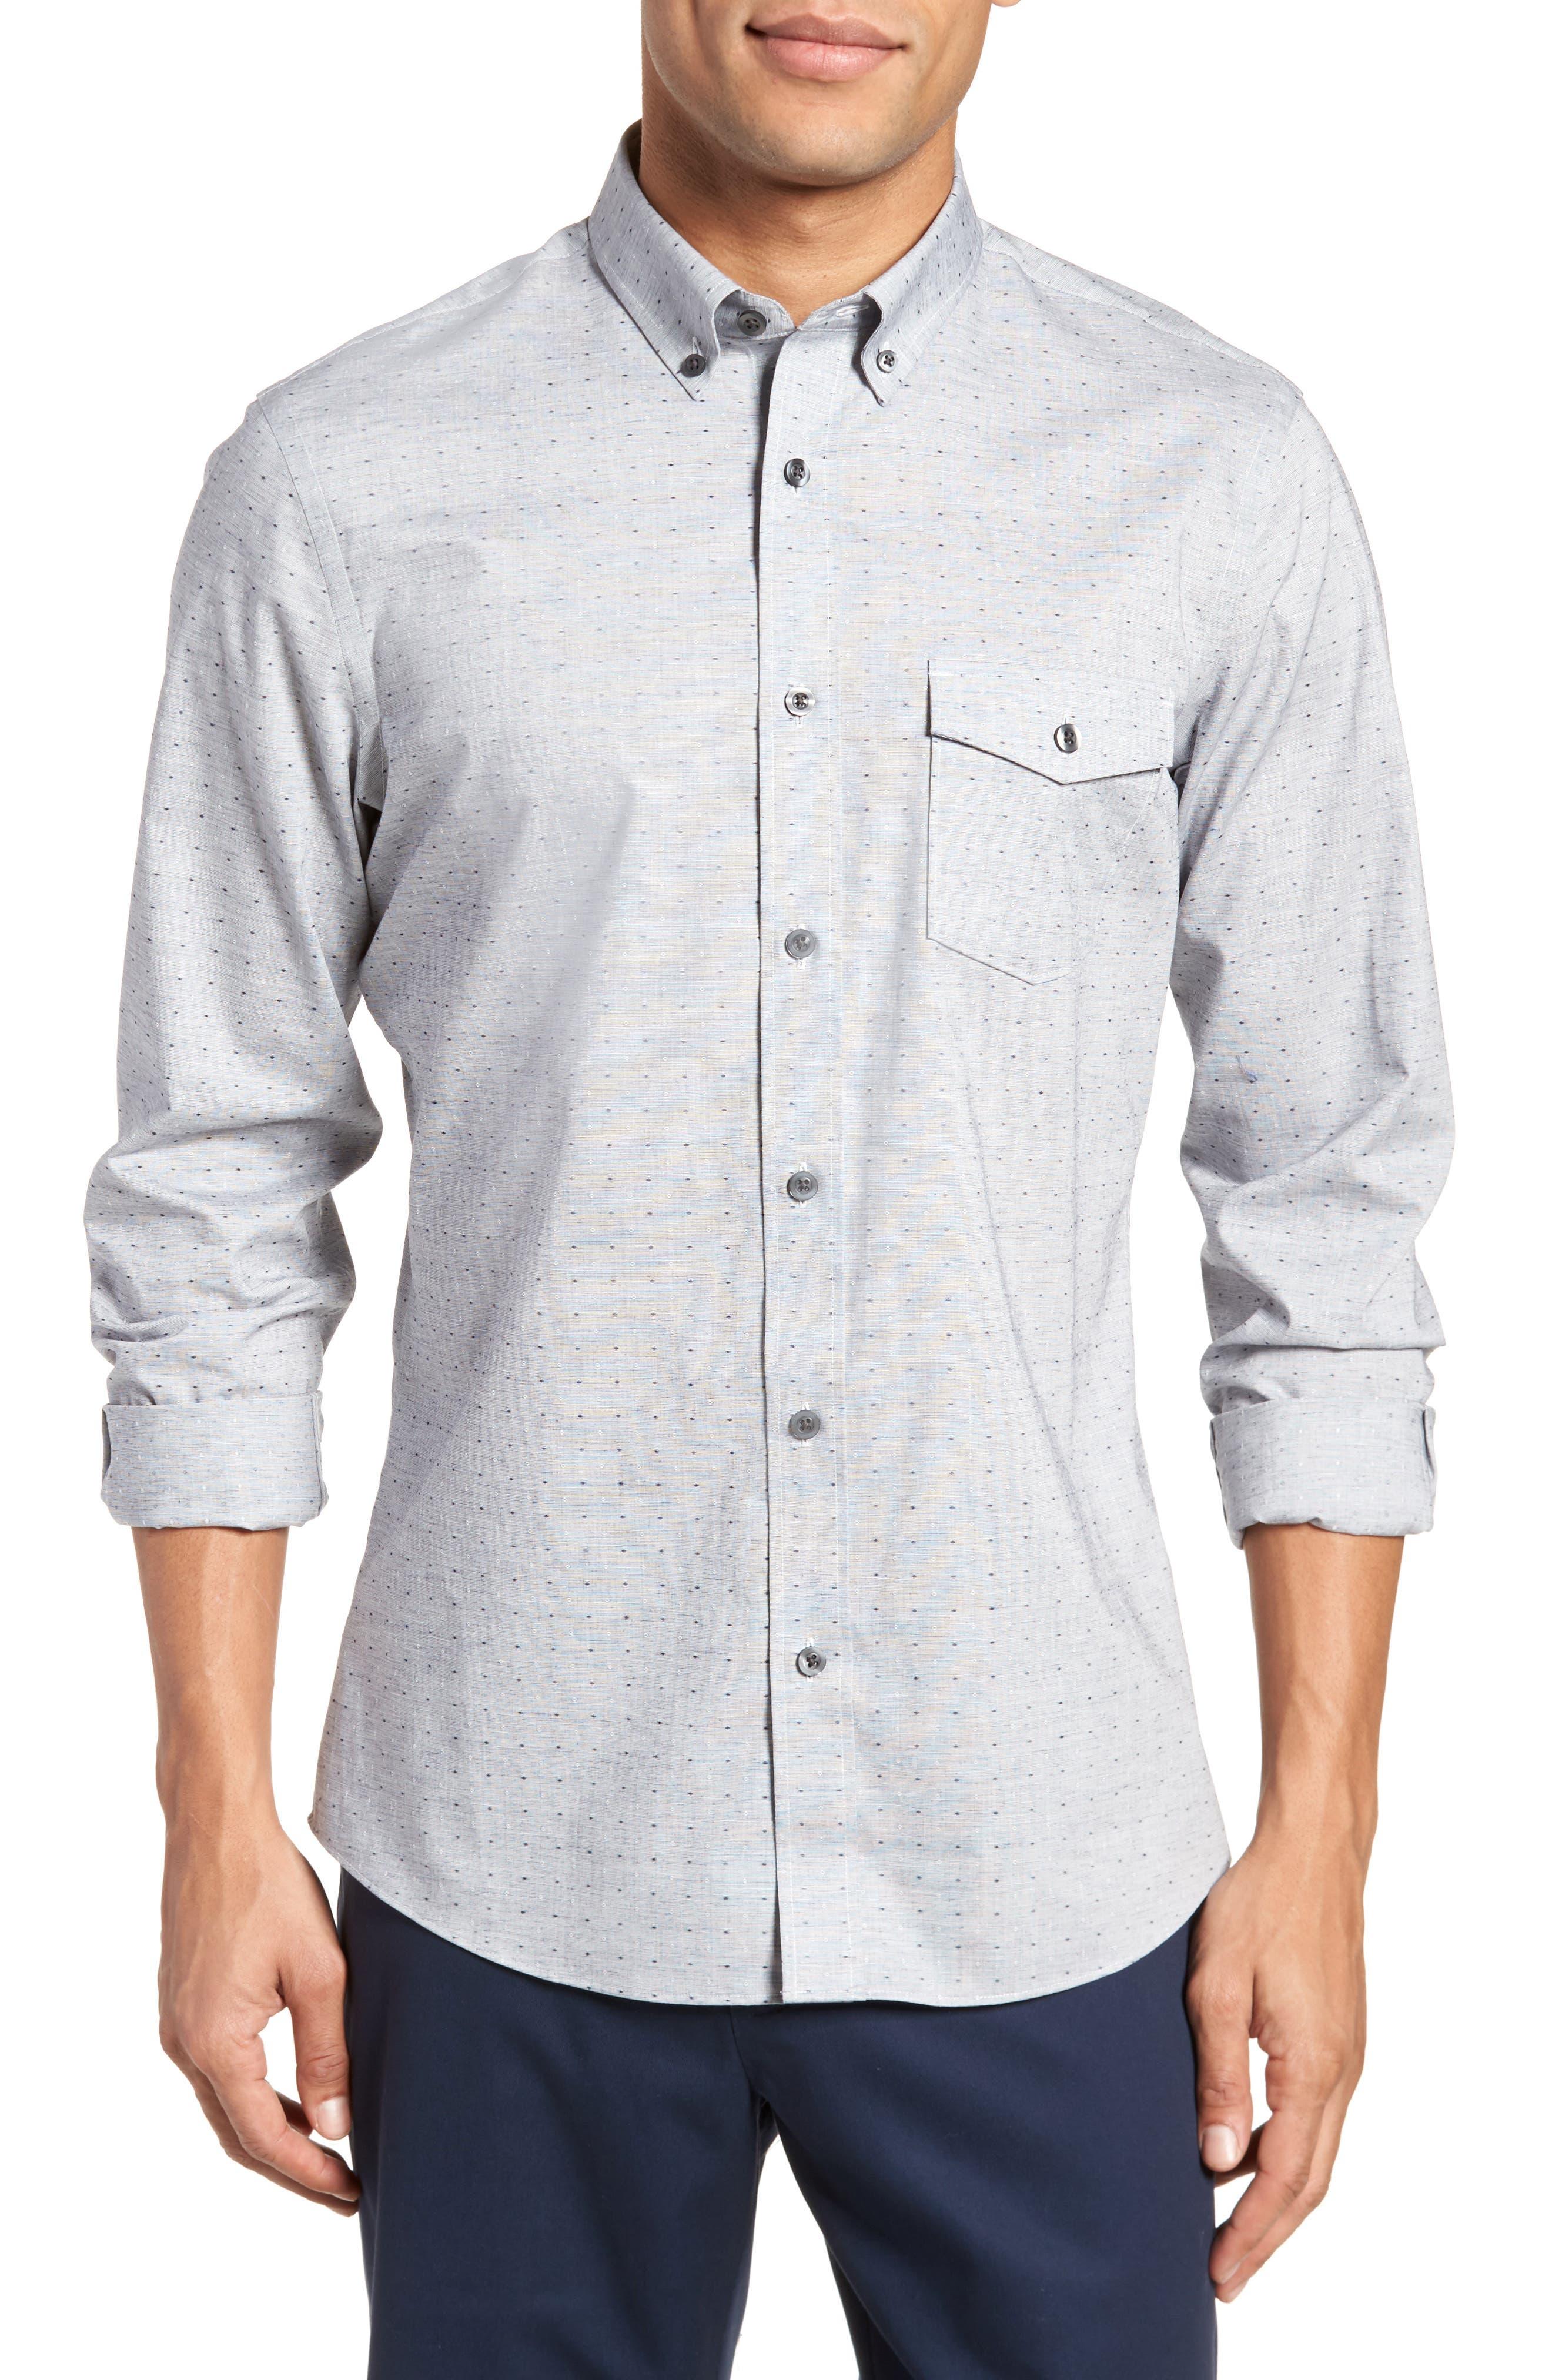 Trim Fit Dobby Sport Shirt,                         Main,                         color, Navy White Eoe Dobby